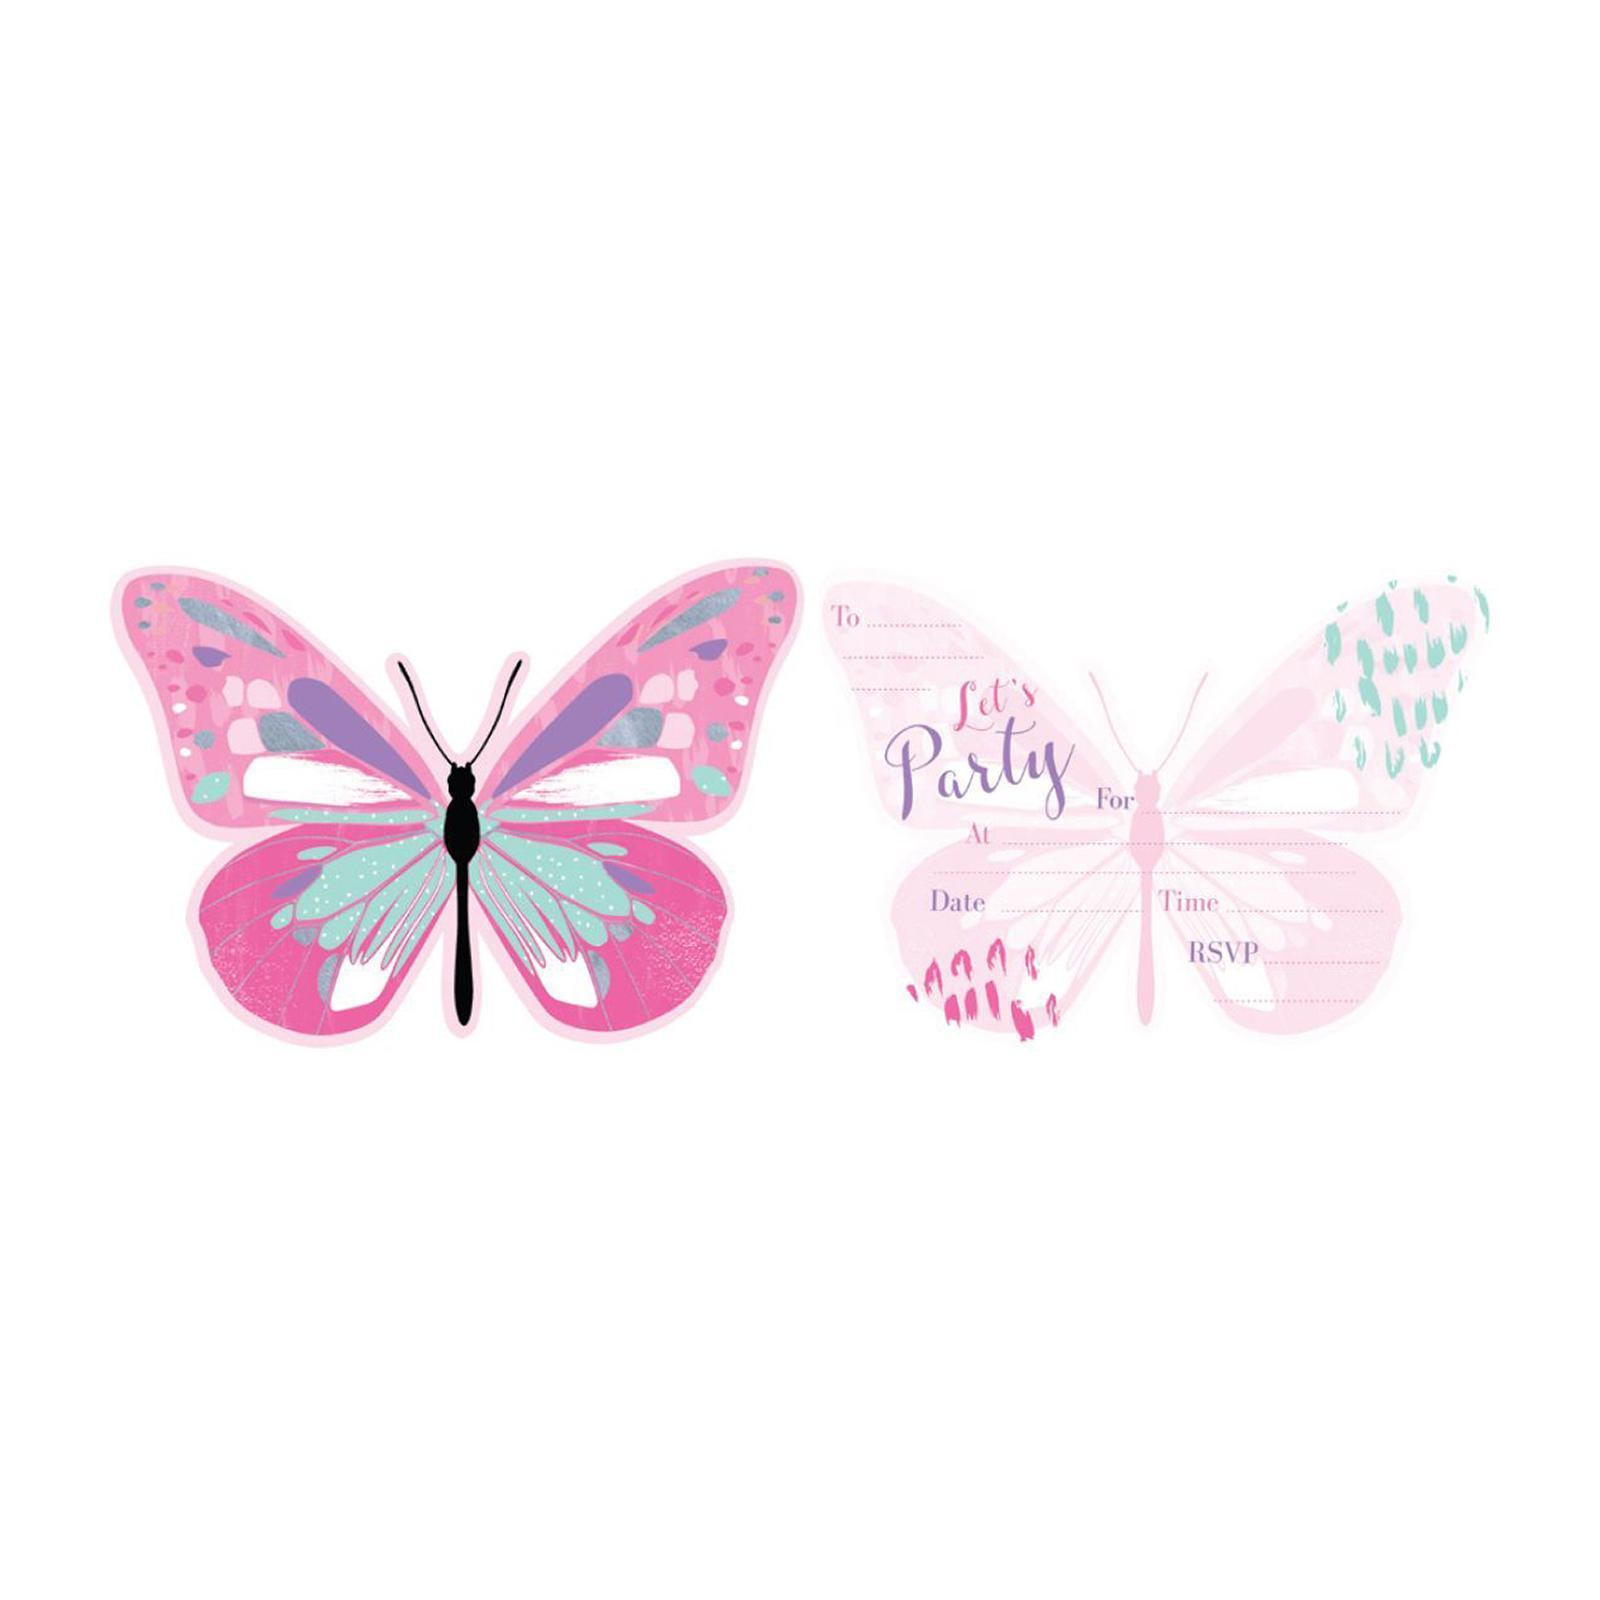 Artwrap Party Invitation - Butterfly